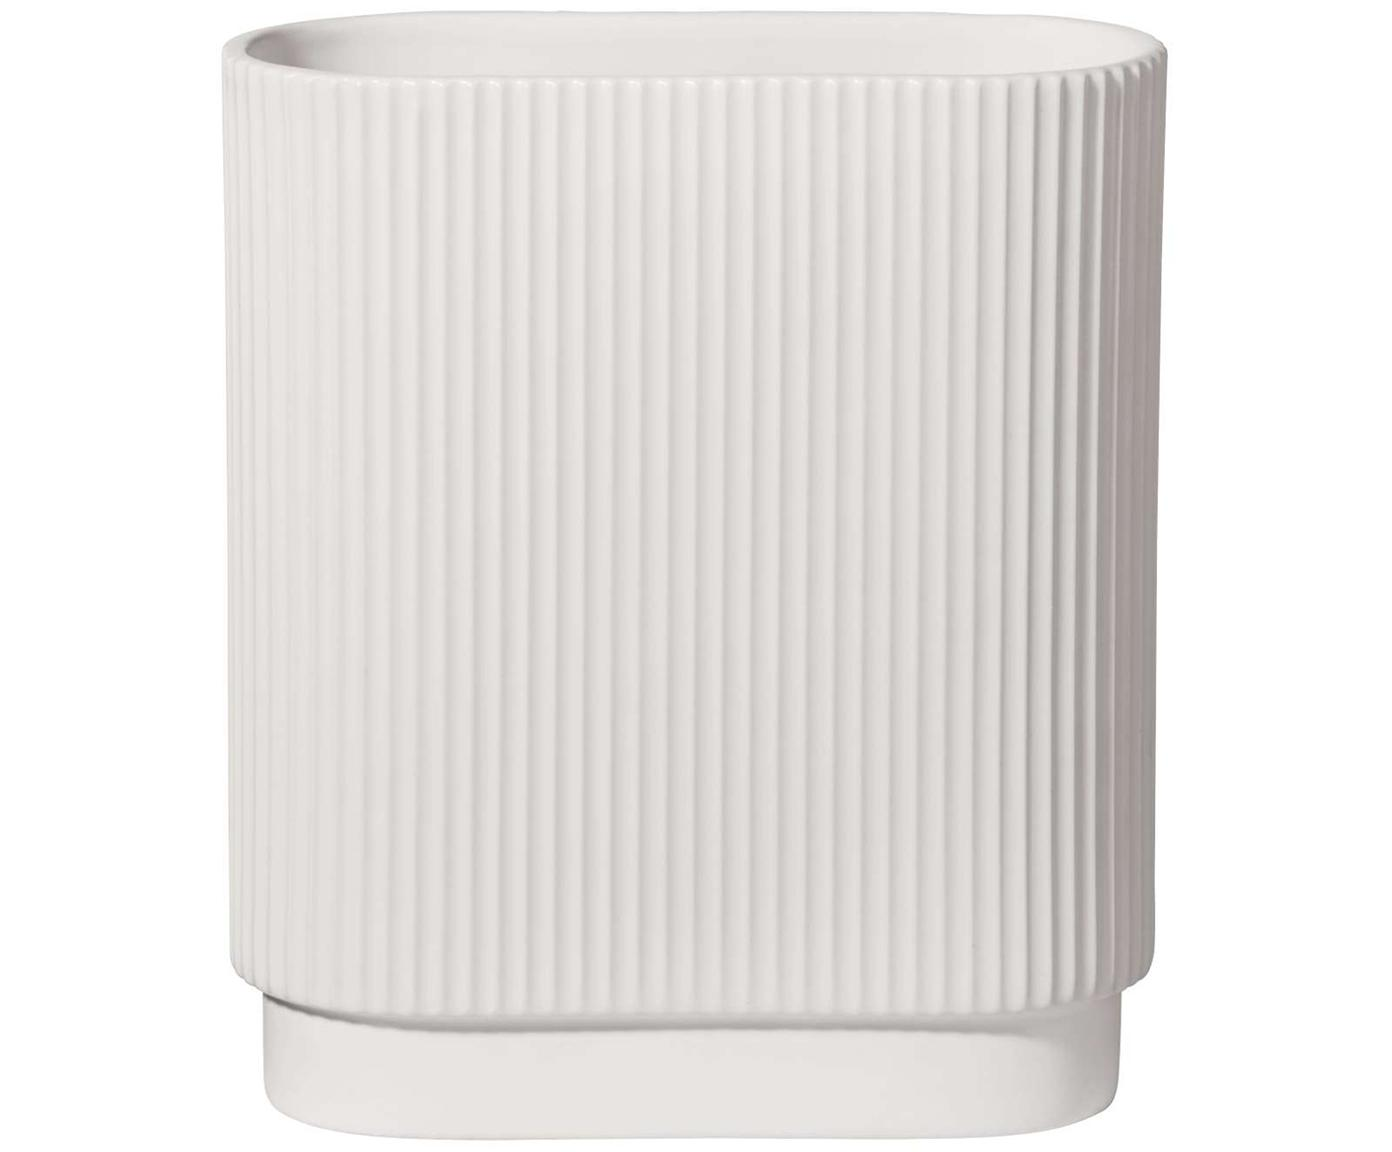 Jarrón grande de porcelana Art Deco, Porcelana, Blanco, An 17 x Al 20 cm